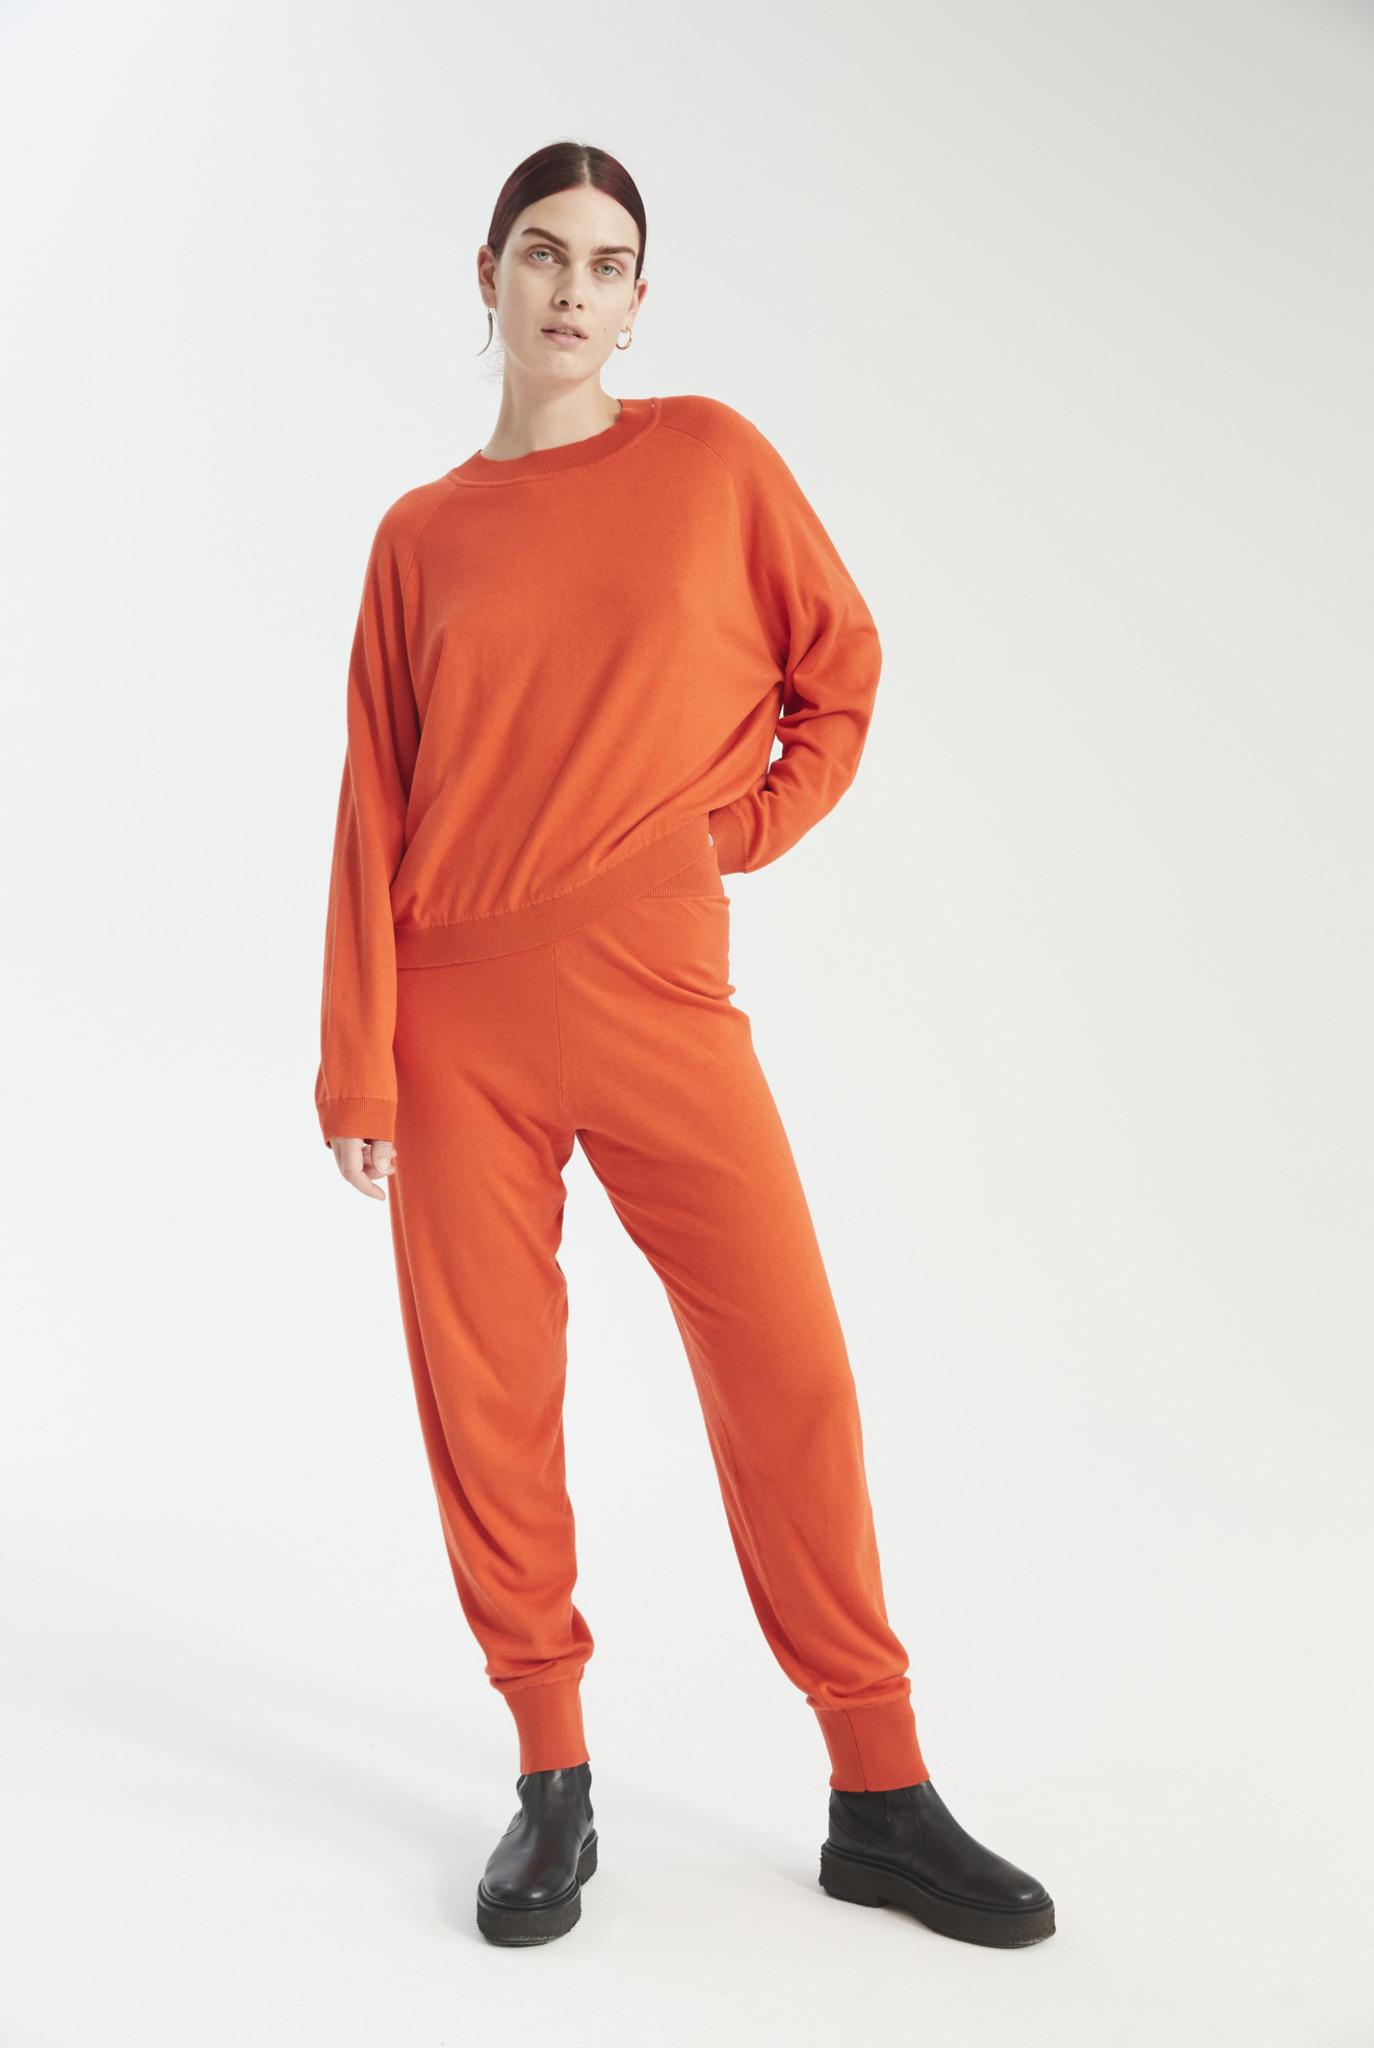 Kelly knit bright orange